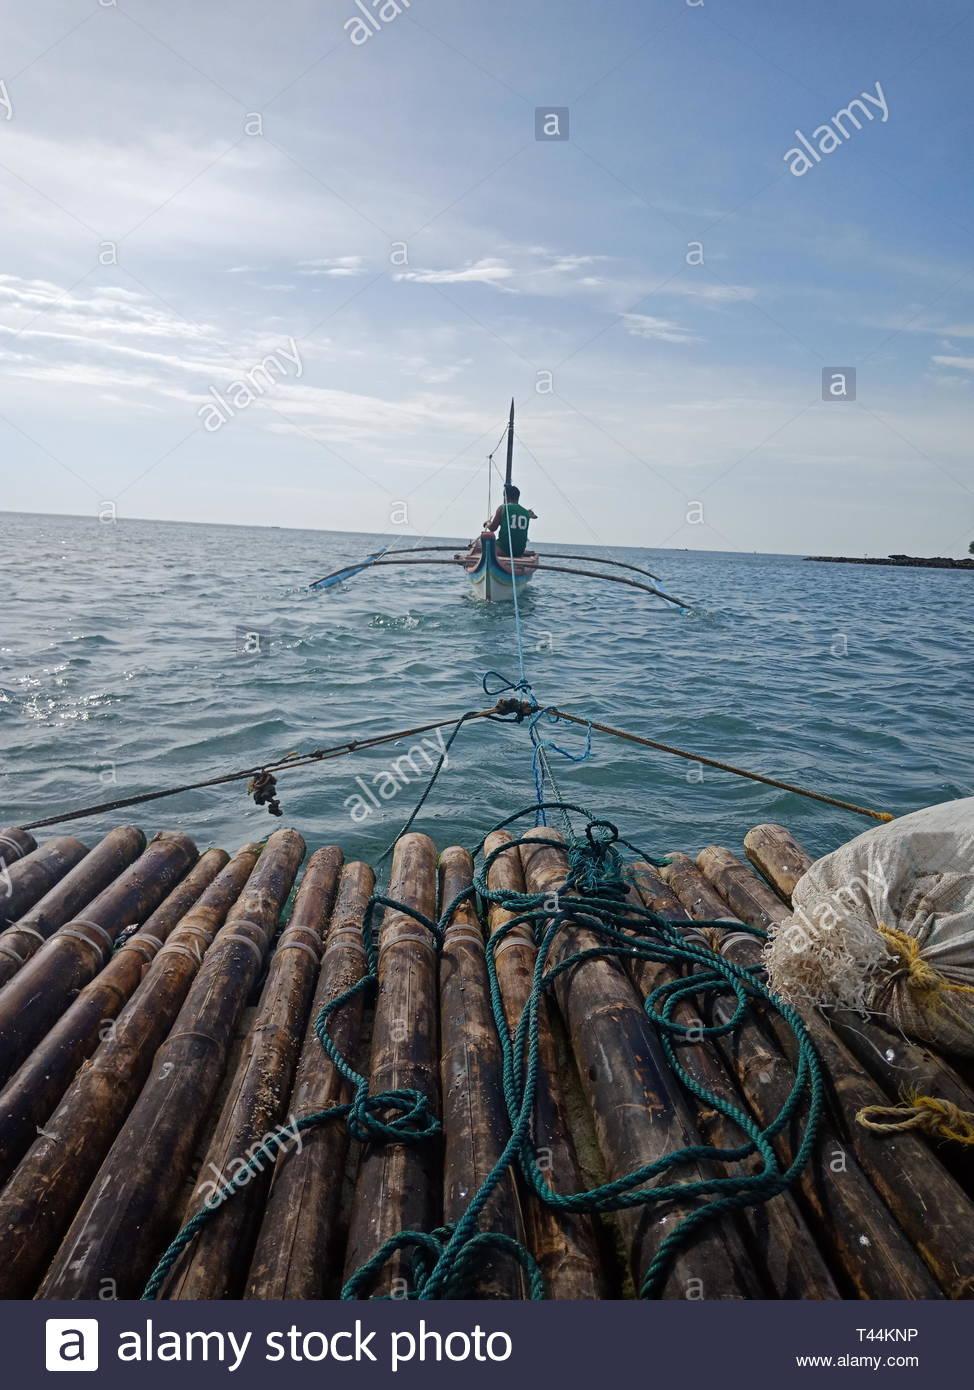 boat pulls raft and bag - Stock Image